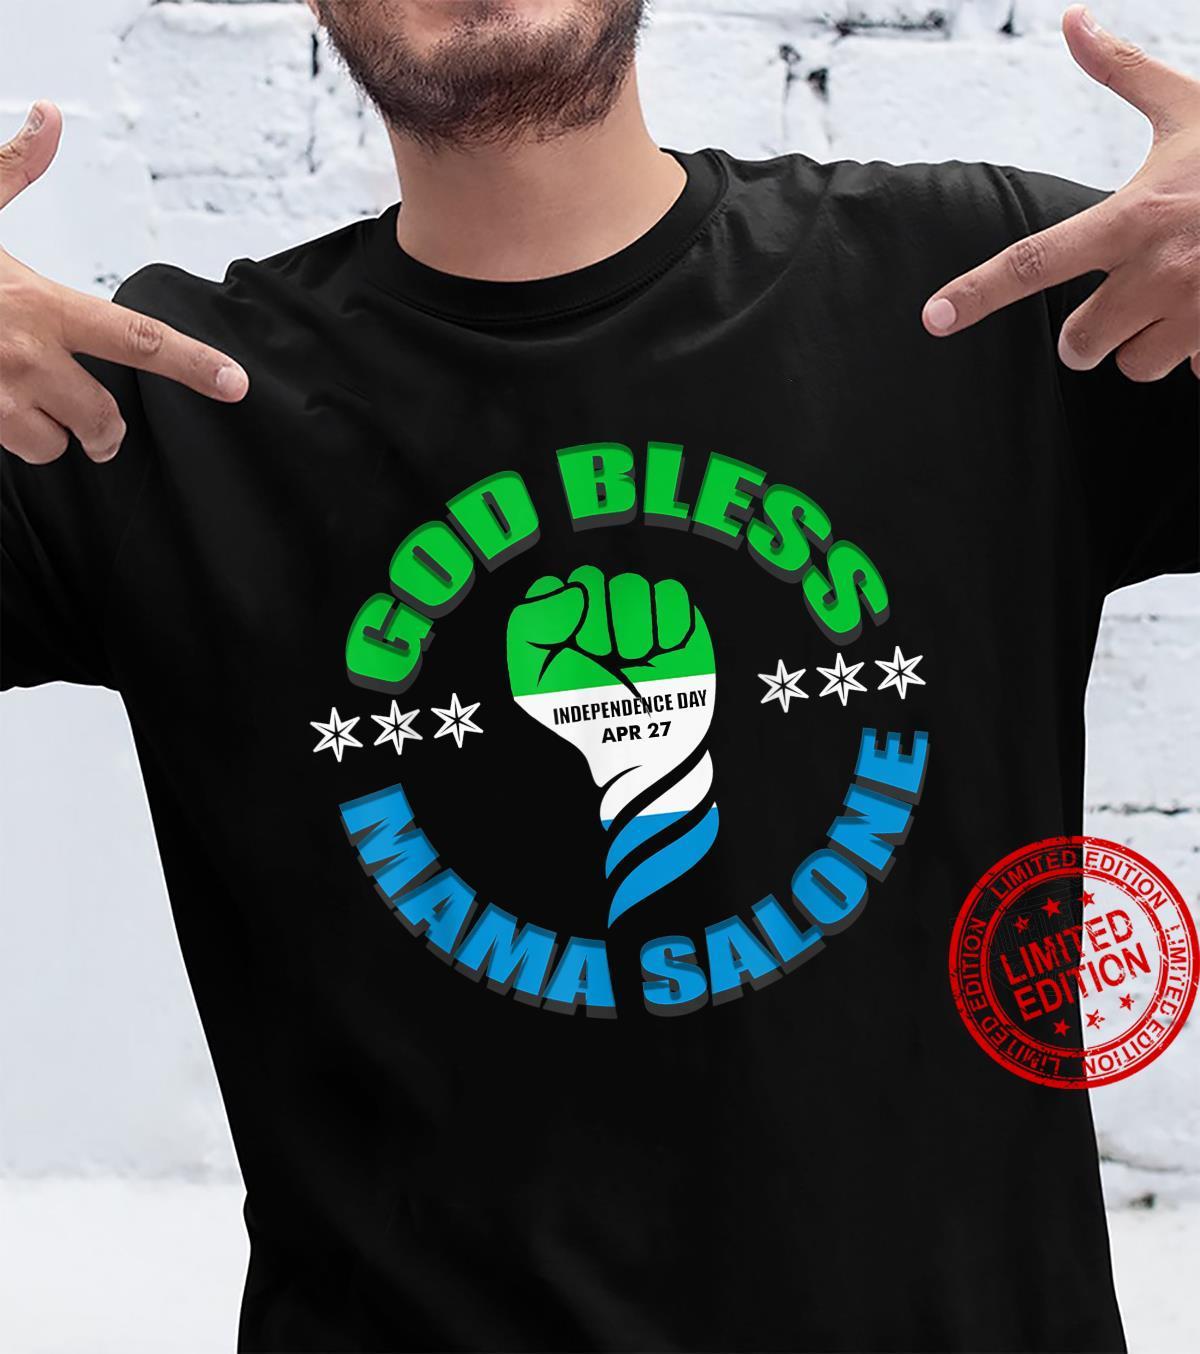 God Bless Mama Salone, Independence, Sierra Leone flag Shirt